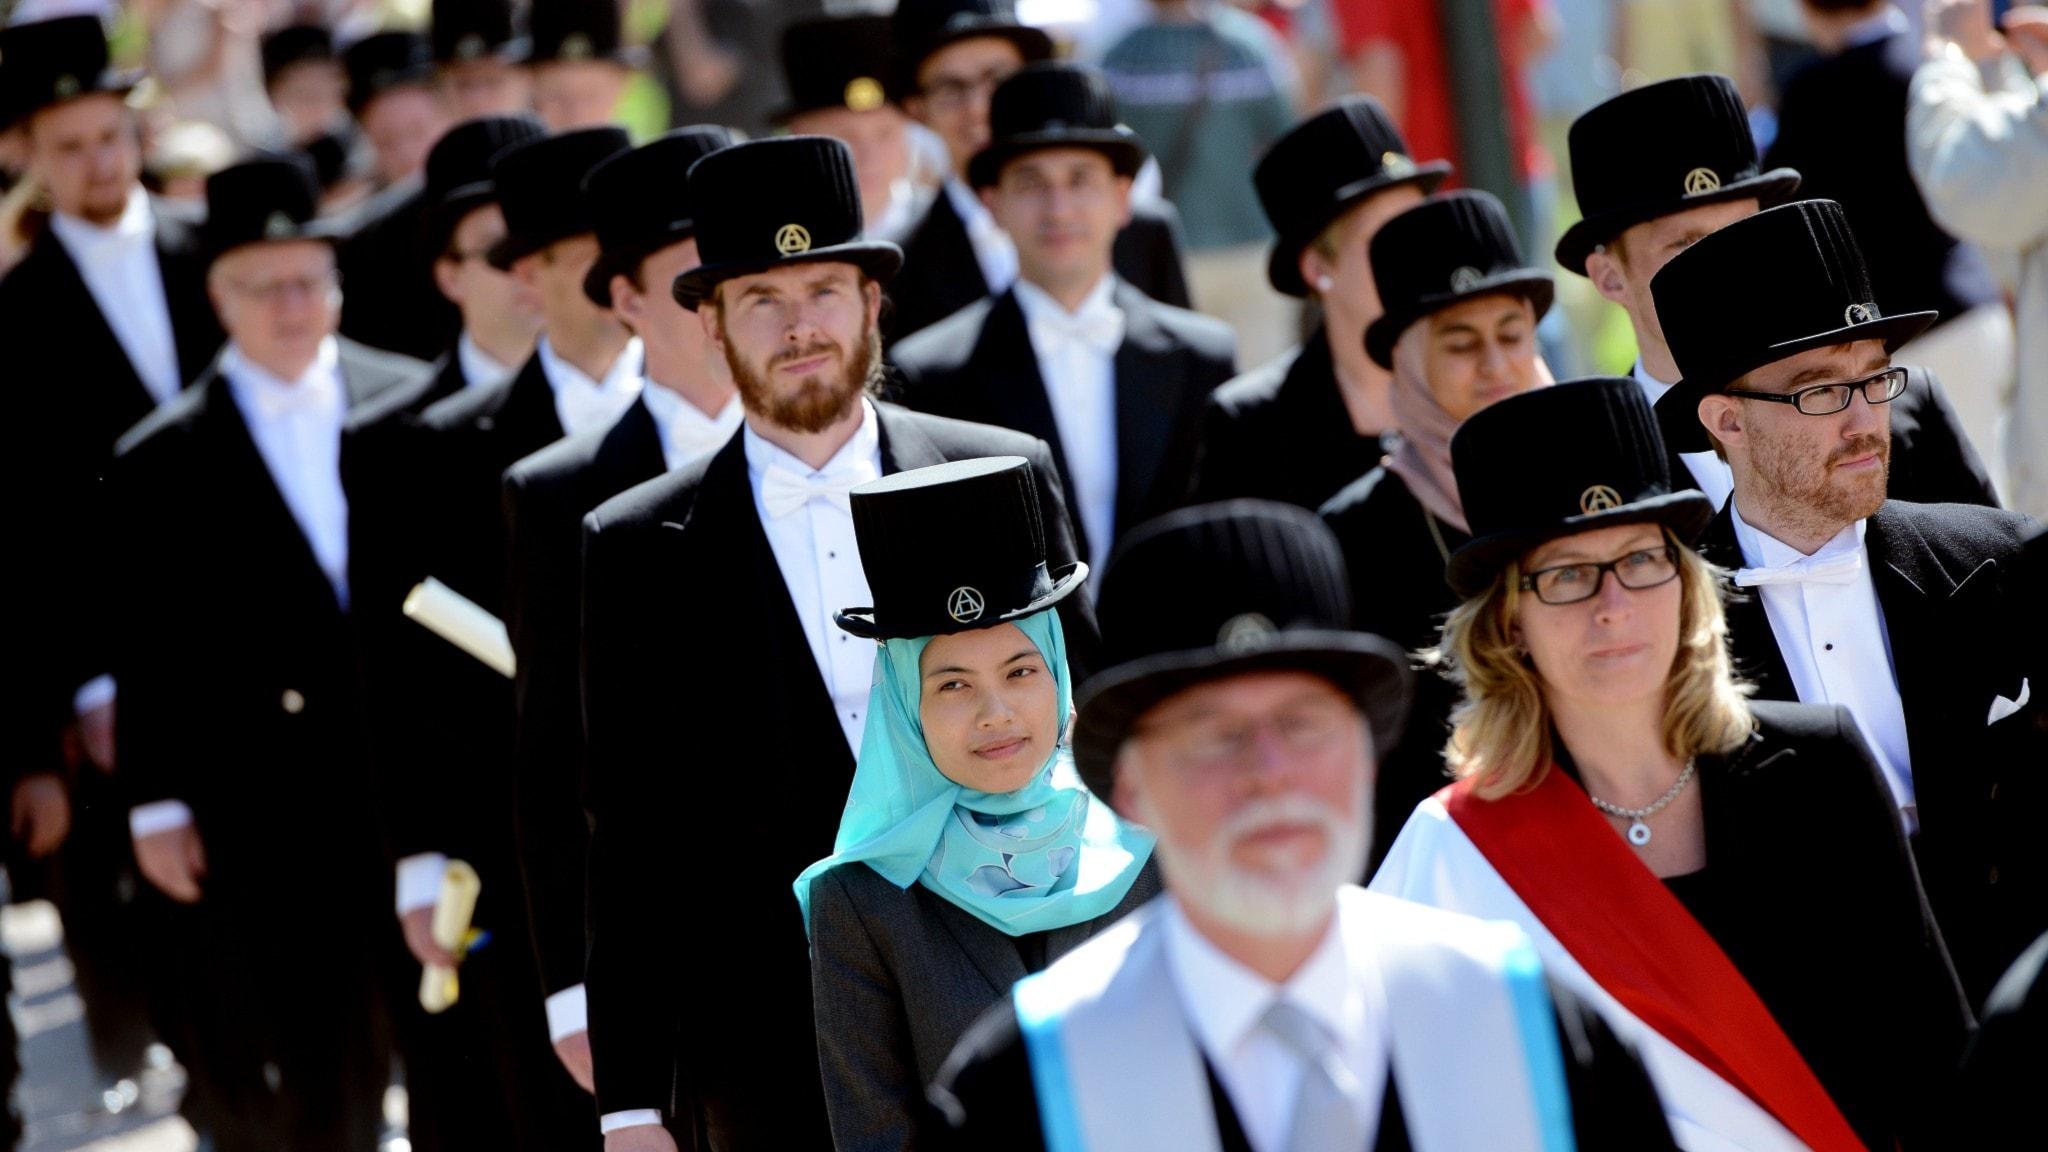 Doktorspromoverings-procession